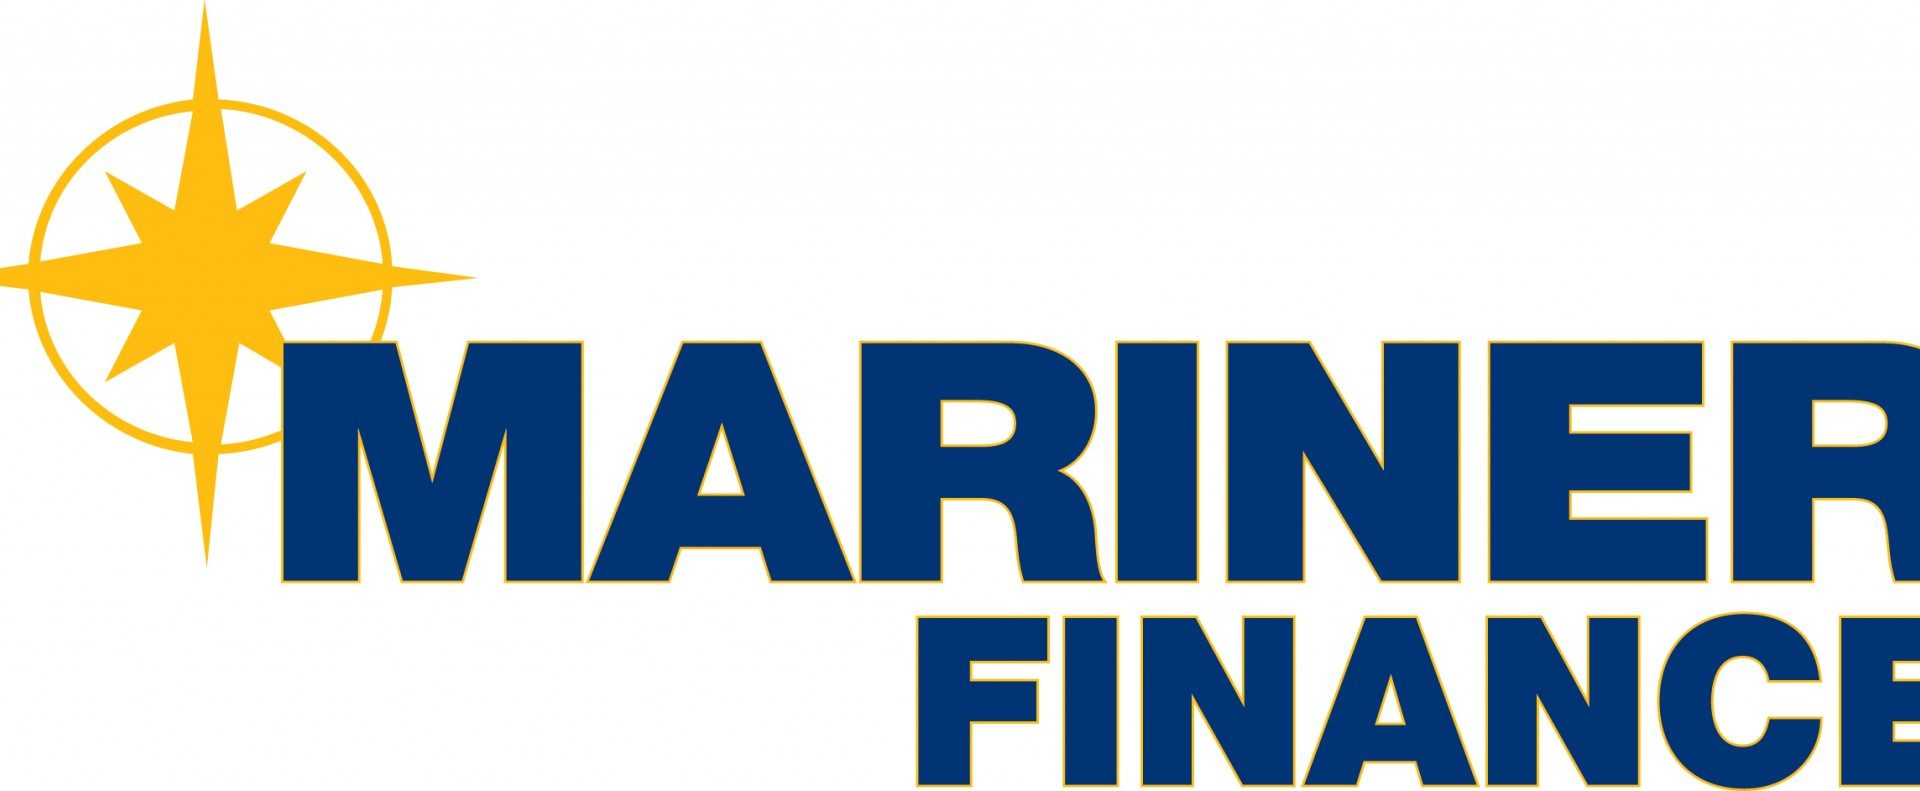 Mariner Finance Personal Loans 2021 Review Nerdwallet